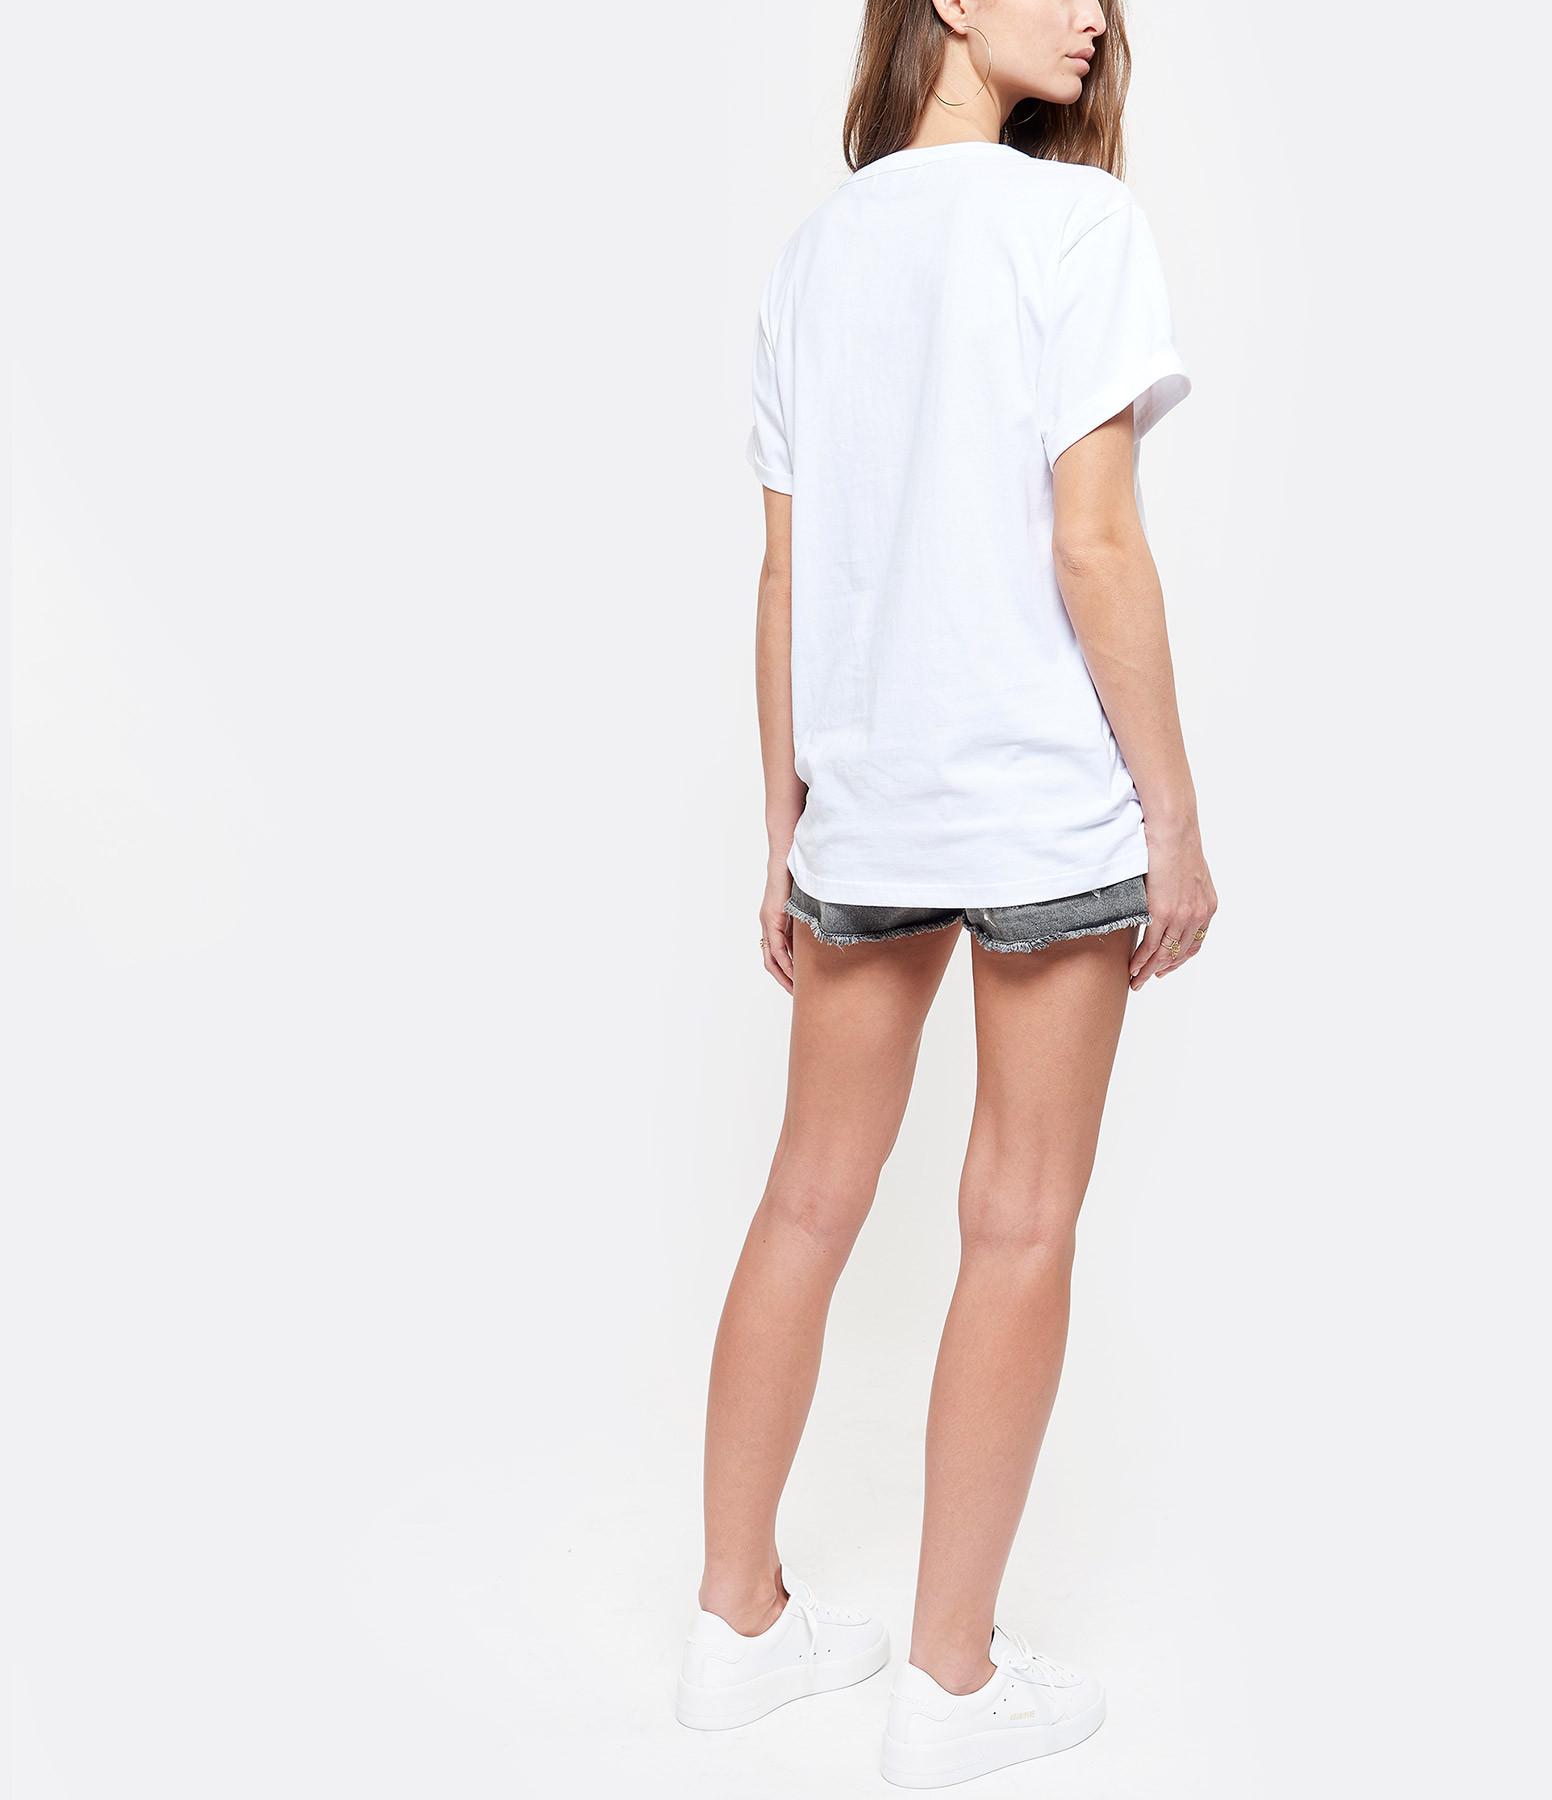 MAISON LABICHE - Tee-shirt Attrape-Coeur Coton Blanc Rouge